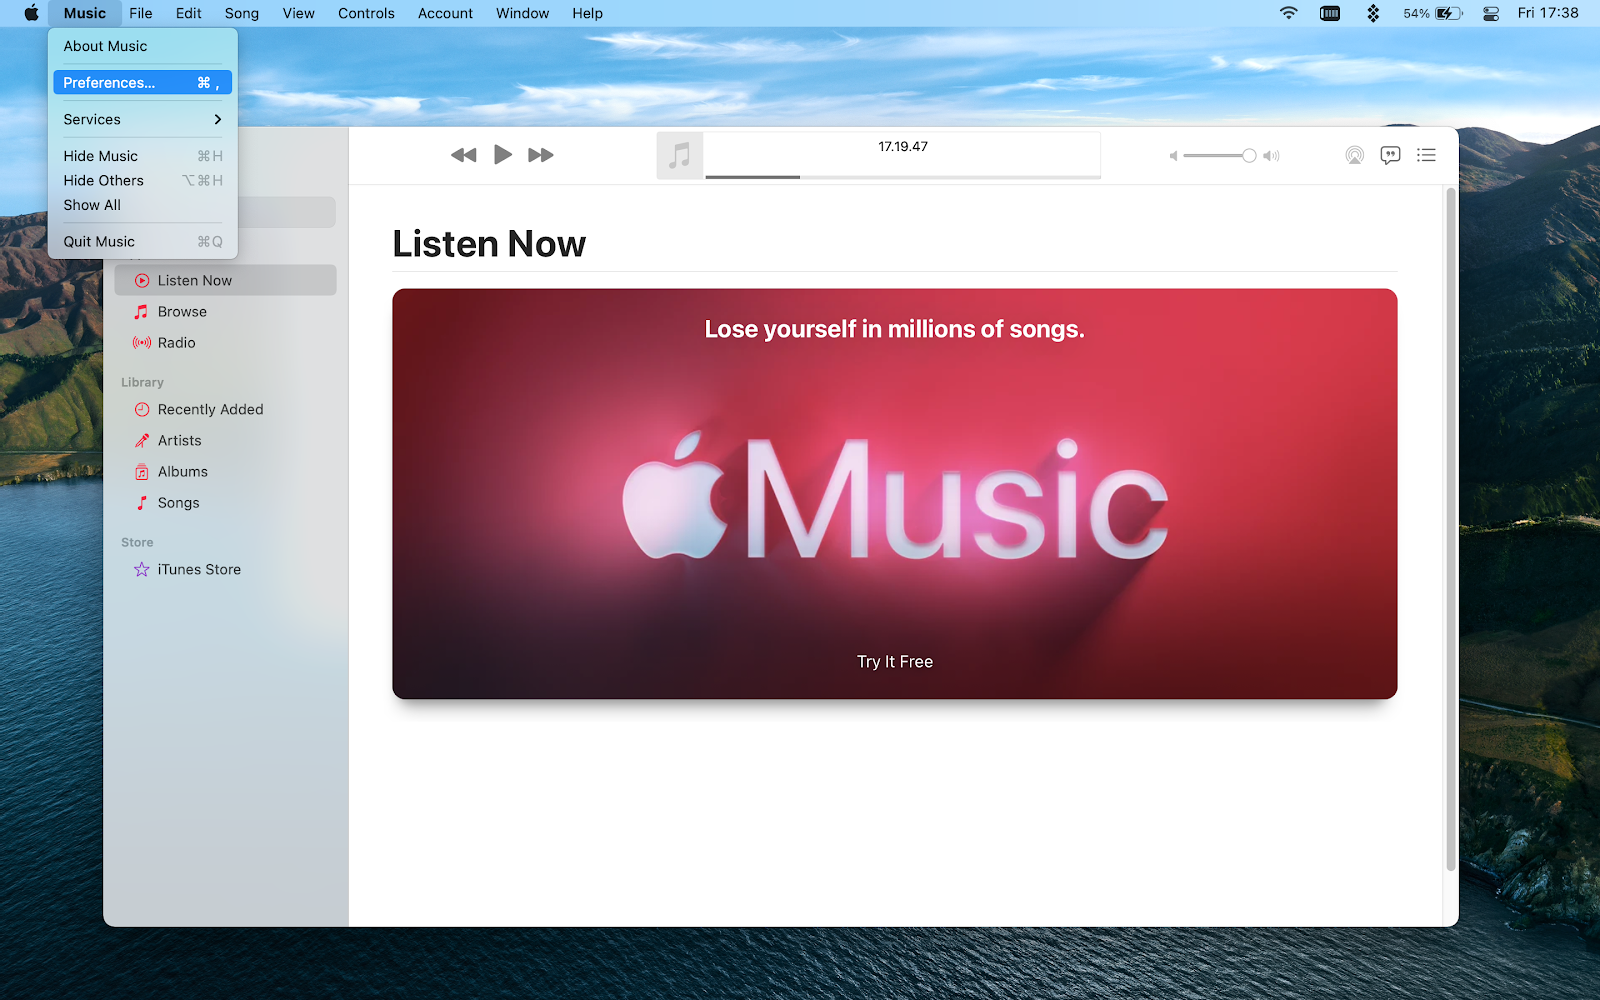 music app preferences